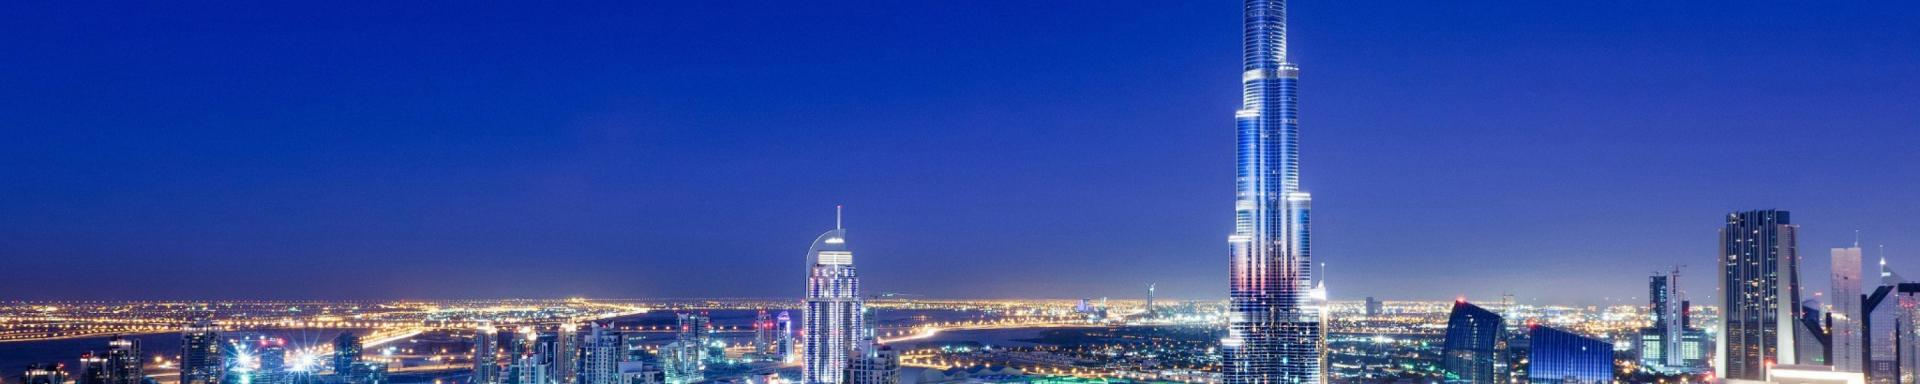 Seawings FREE At the Top, Burj Khalifa Ticket